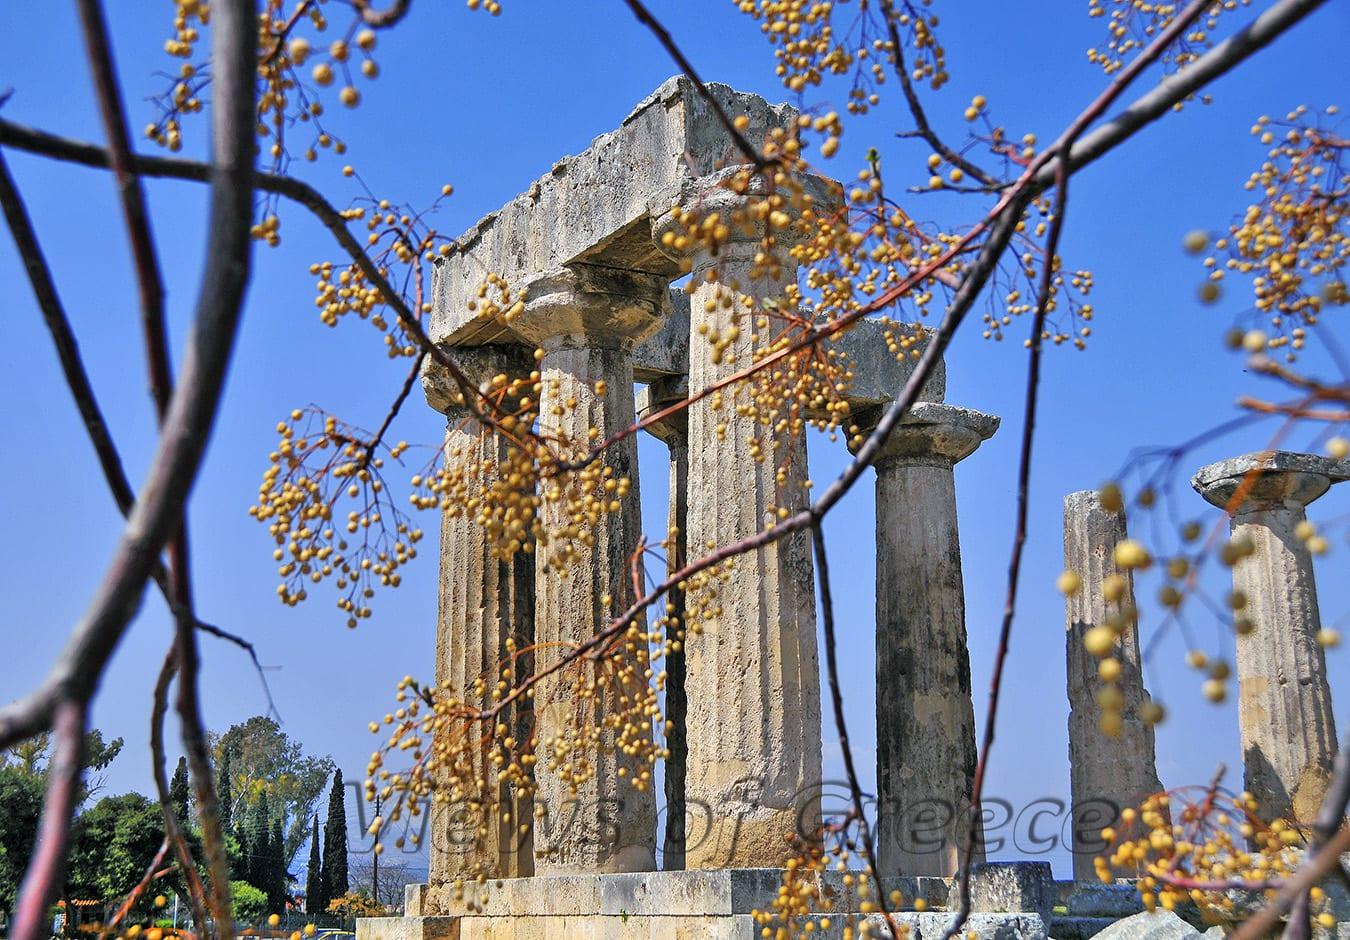 ancient Korinthos, Peloponnese, museum, greece, archaeological, historic, archaeology, greek, greece, akrokorinthos, korinthos, temple, fortress, Venetian, medieval, castle, Corinth canal, Αρχαία Κόρινθος, νομός Κορινθίας, Πελοπόννησος, Ακροκόρινθος, κάστρο, Πελοπόννησος, Φραγκοκρατία, αρχαιολογικός χώρος, διώρυγα, διολκός,